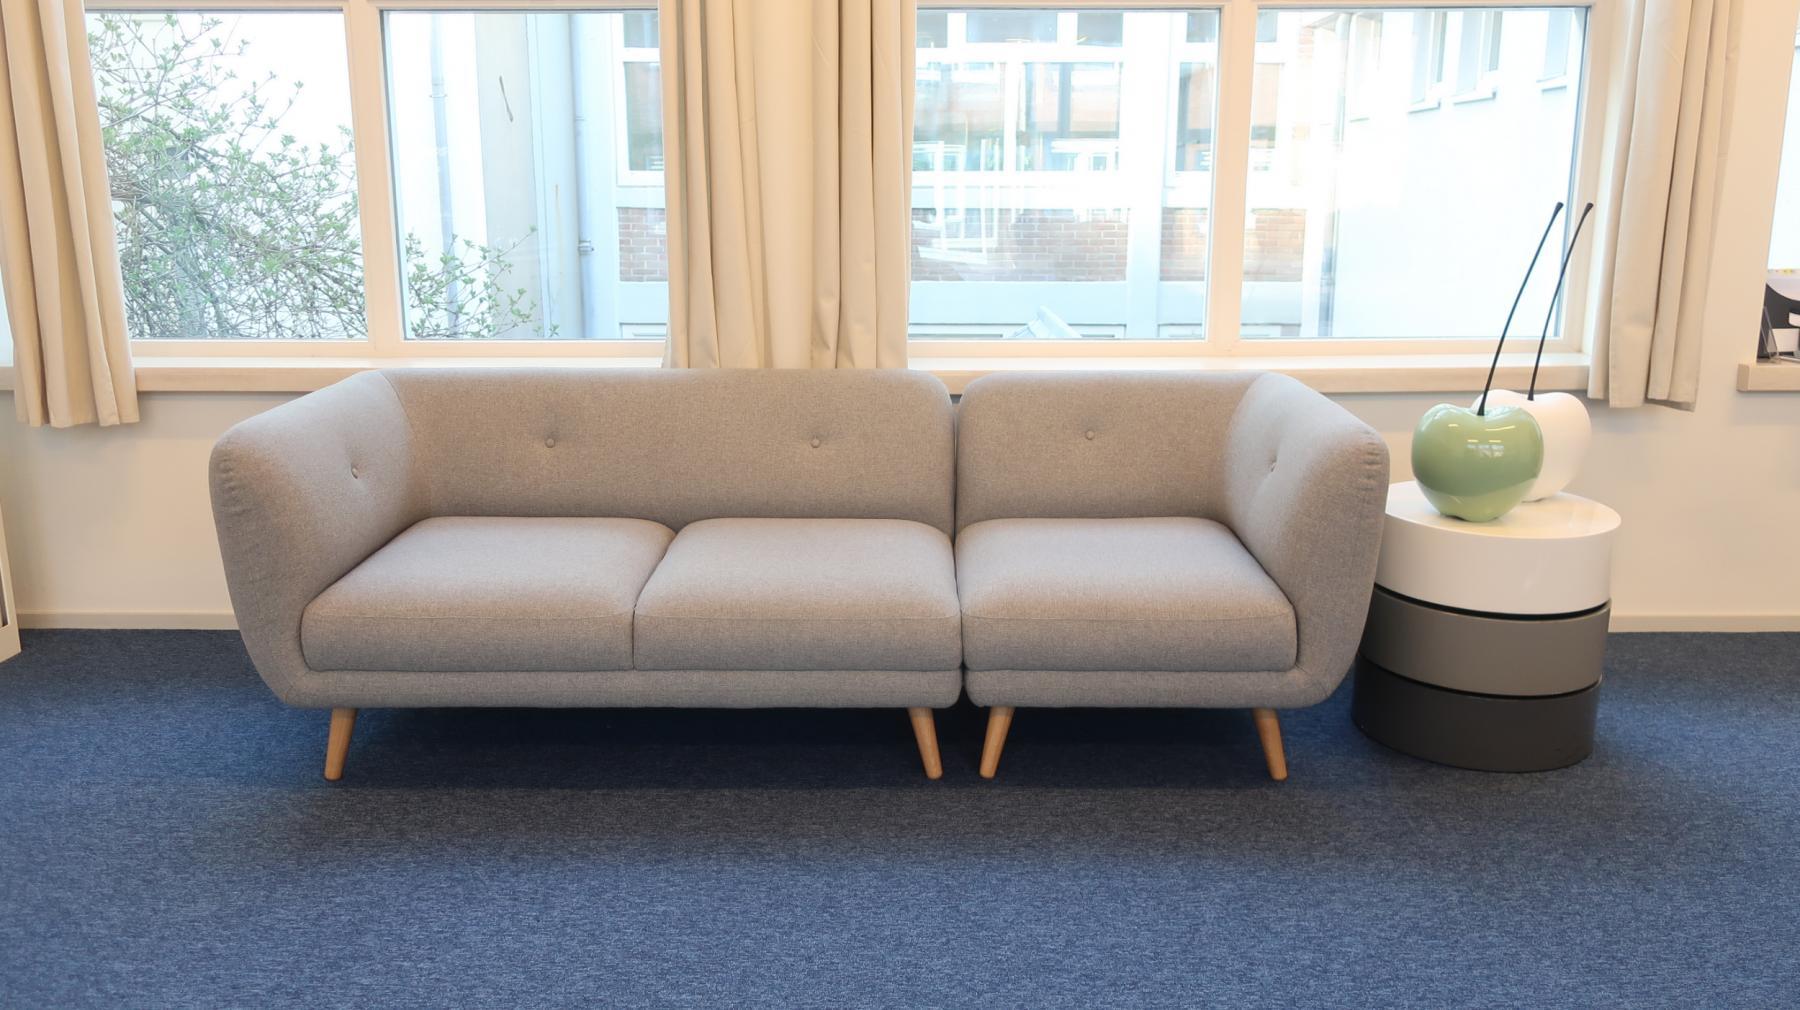 Rent office space Kraijenhoffstraat 137a, Amsterdam (10)